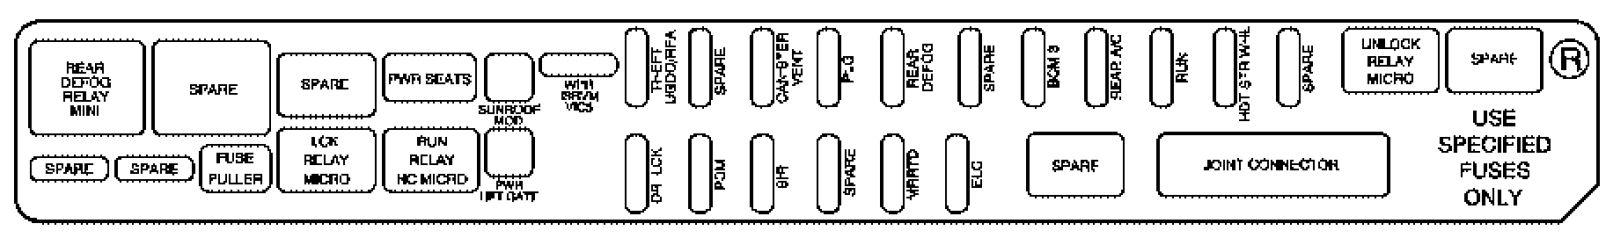 07 Srx Fuse Box Wiring Diagram